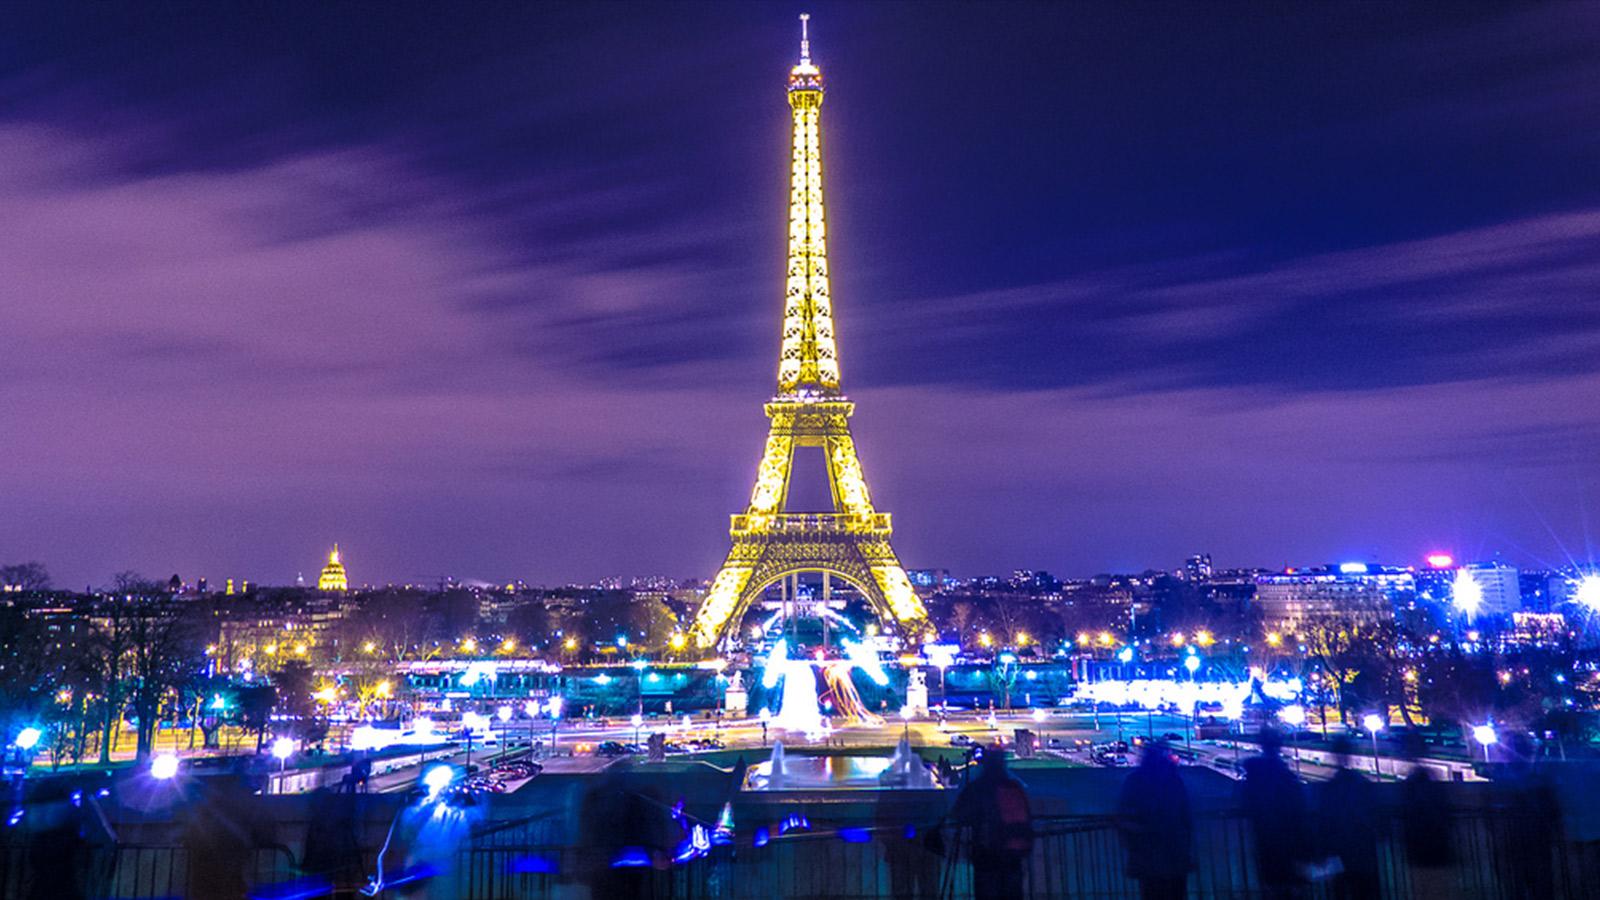 MMDI 2017 @ Paris, France